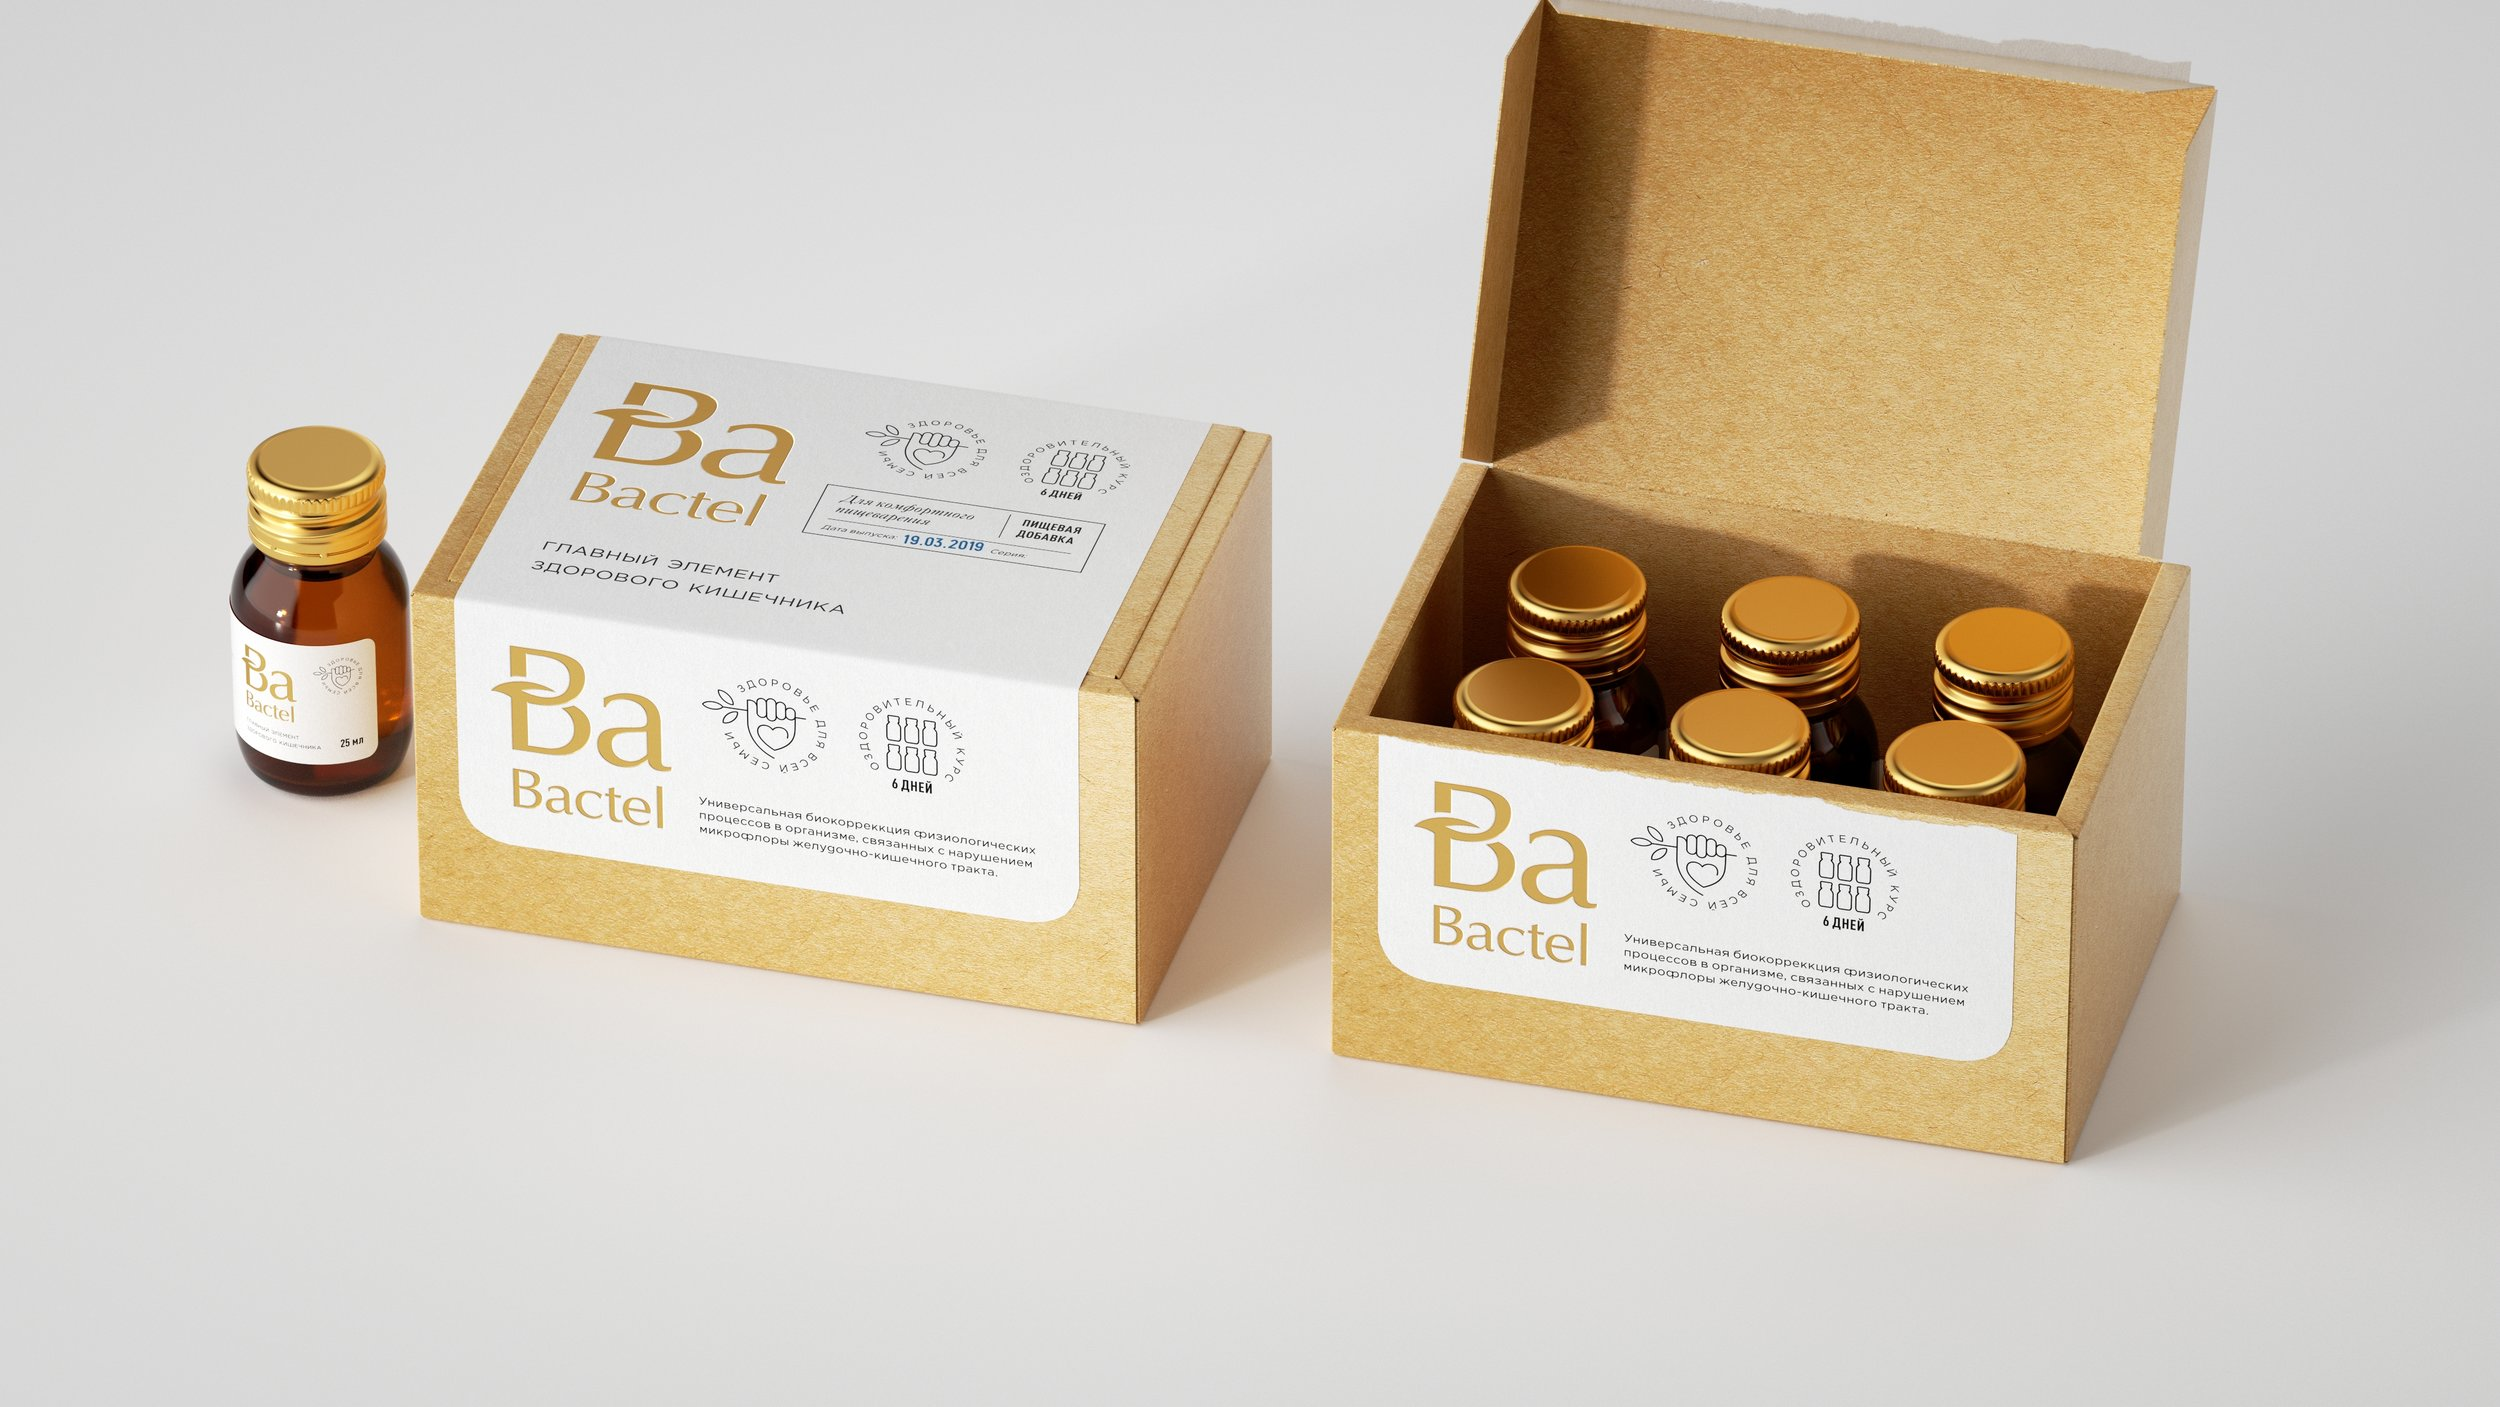 Nutrition Supplement Drug Bactel Package Design / World Brand Design Society